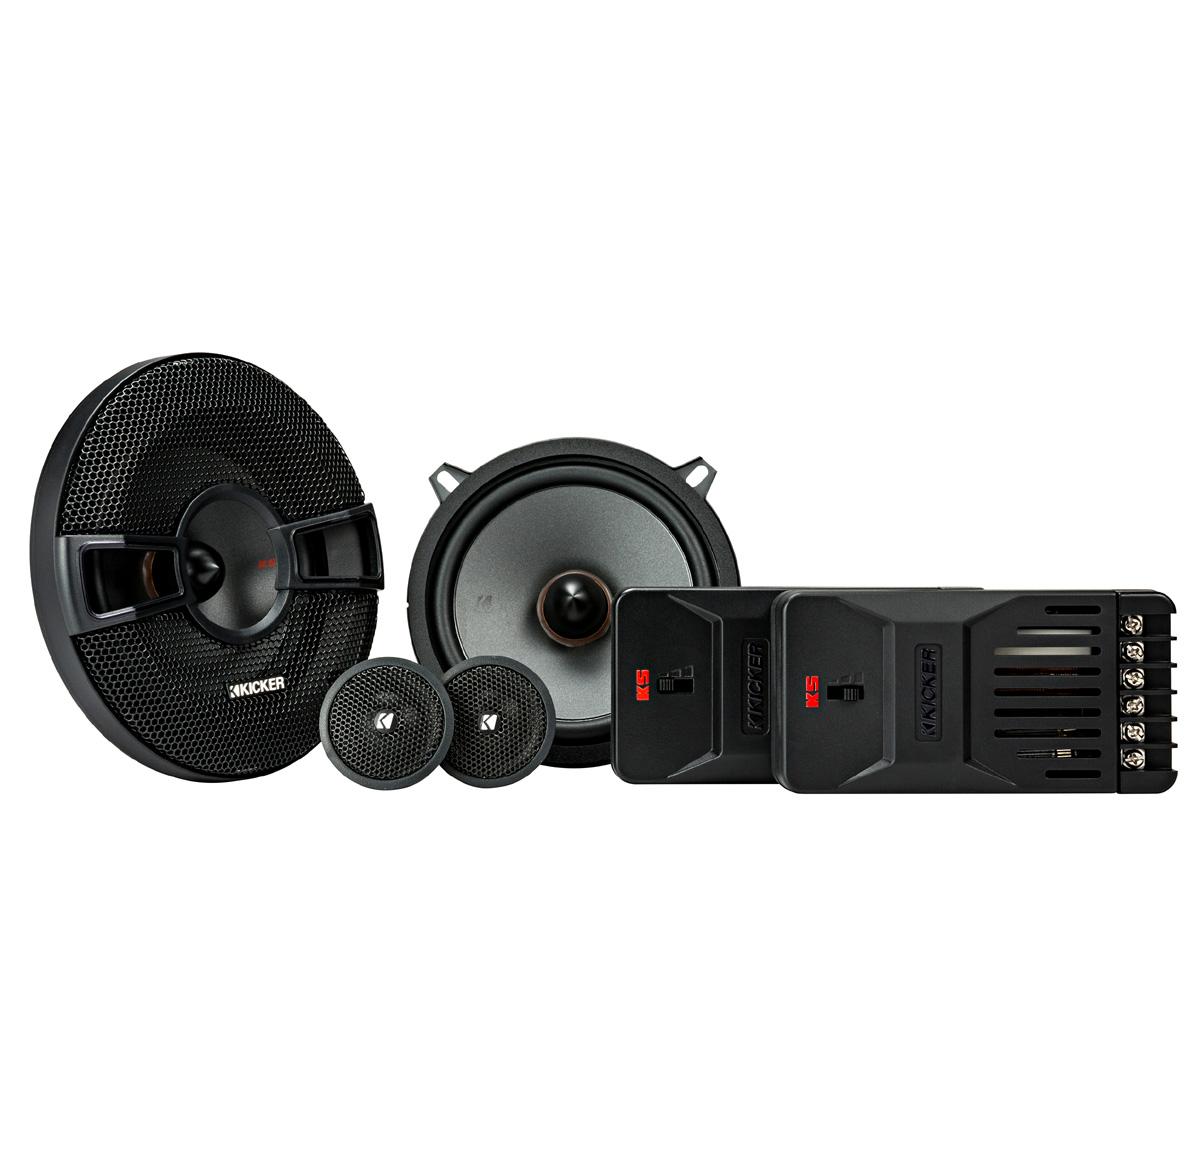 "KICKER 44KSS504 5.25"" (130mm) Component system w/1"" (25mm) tweeters, 4ohm, RoHS Compliant"